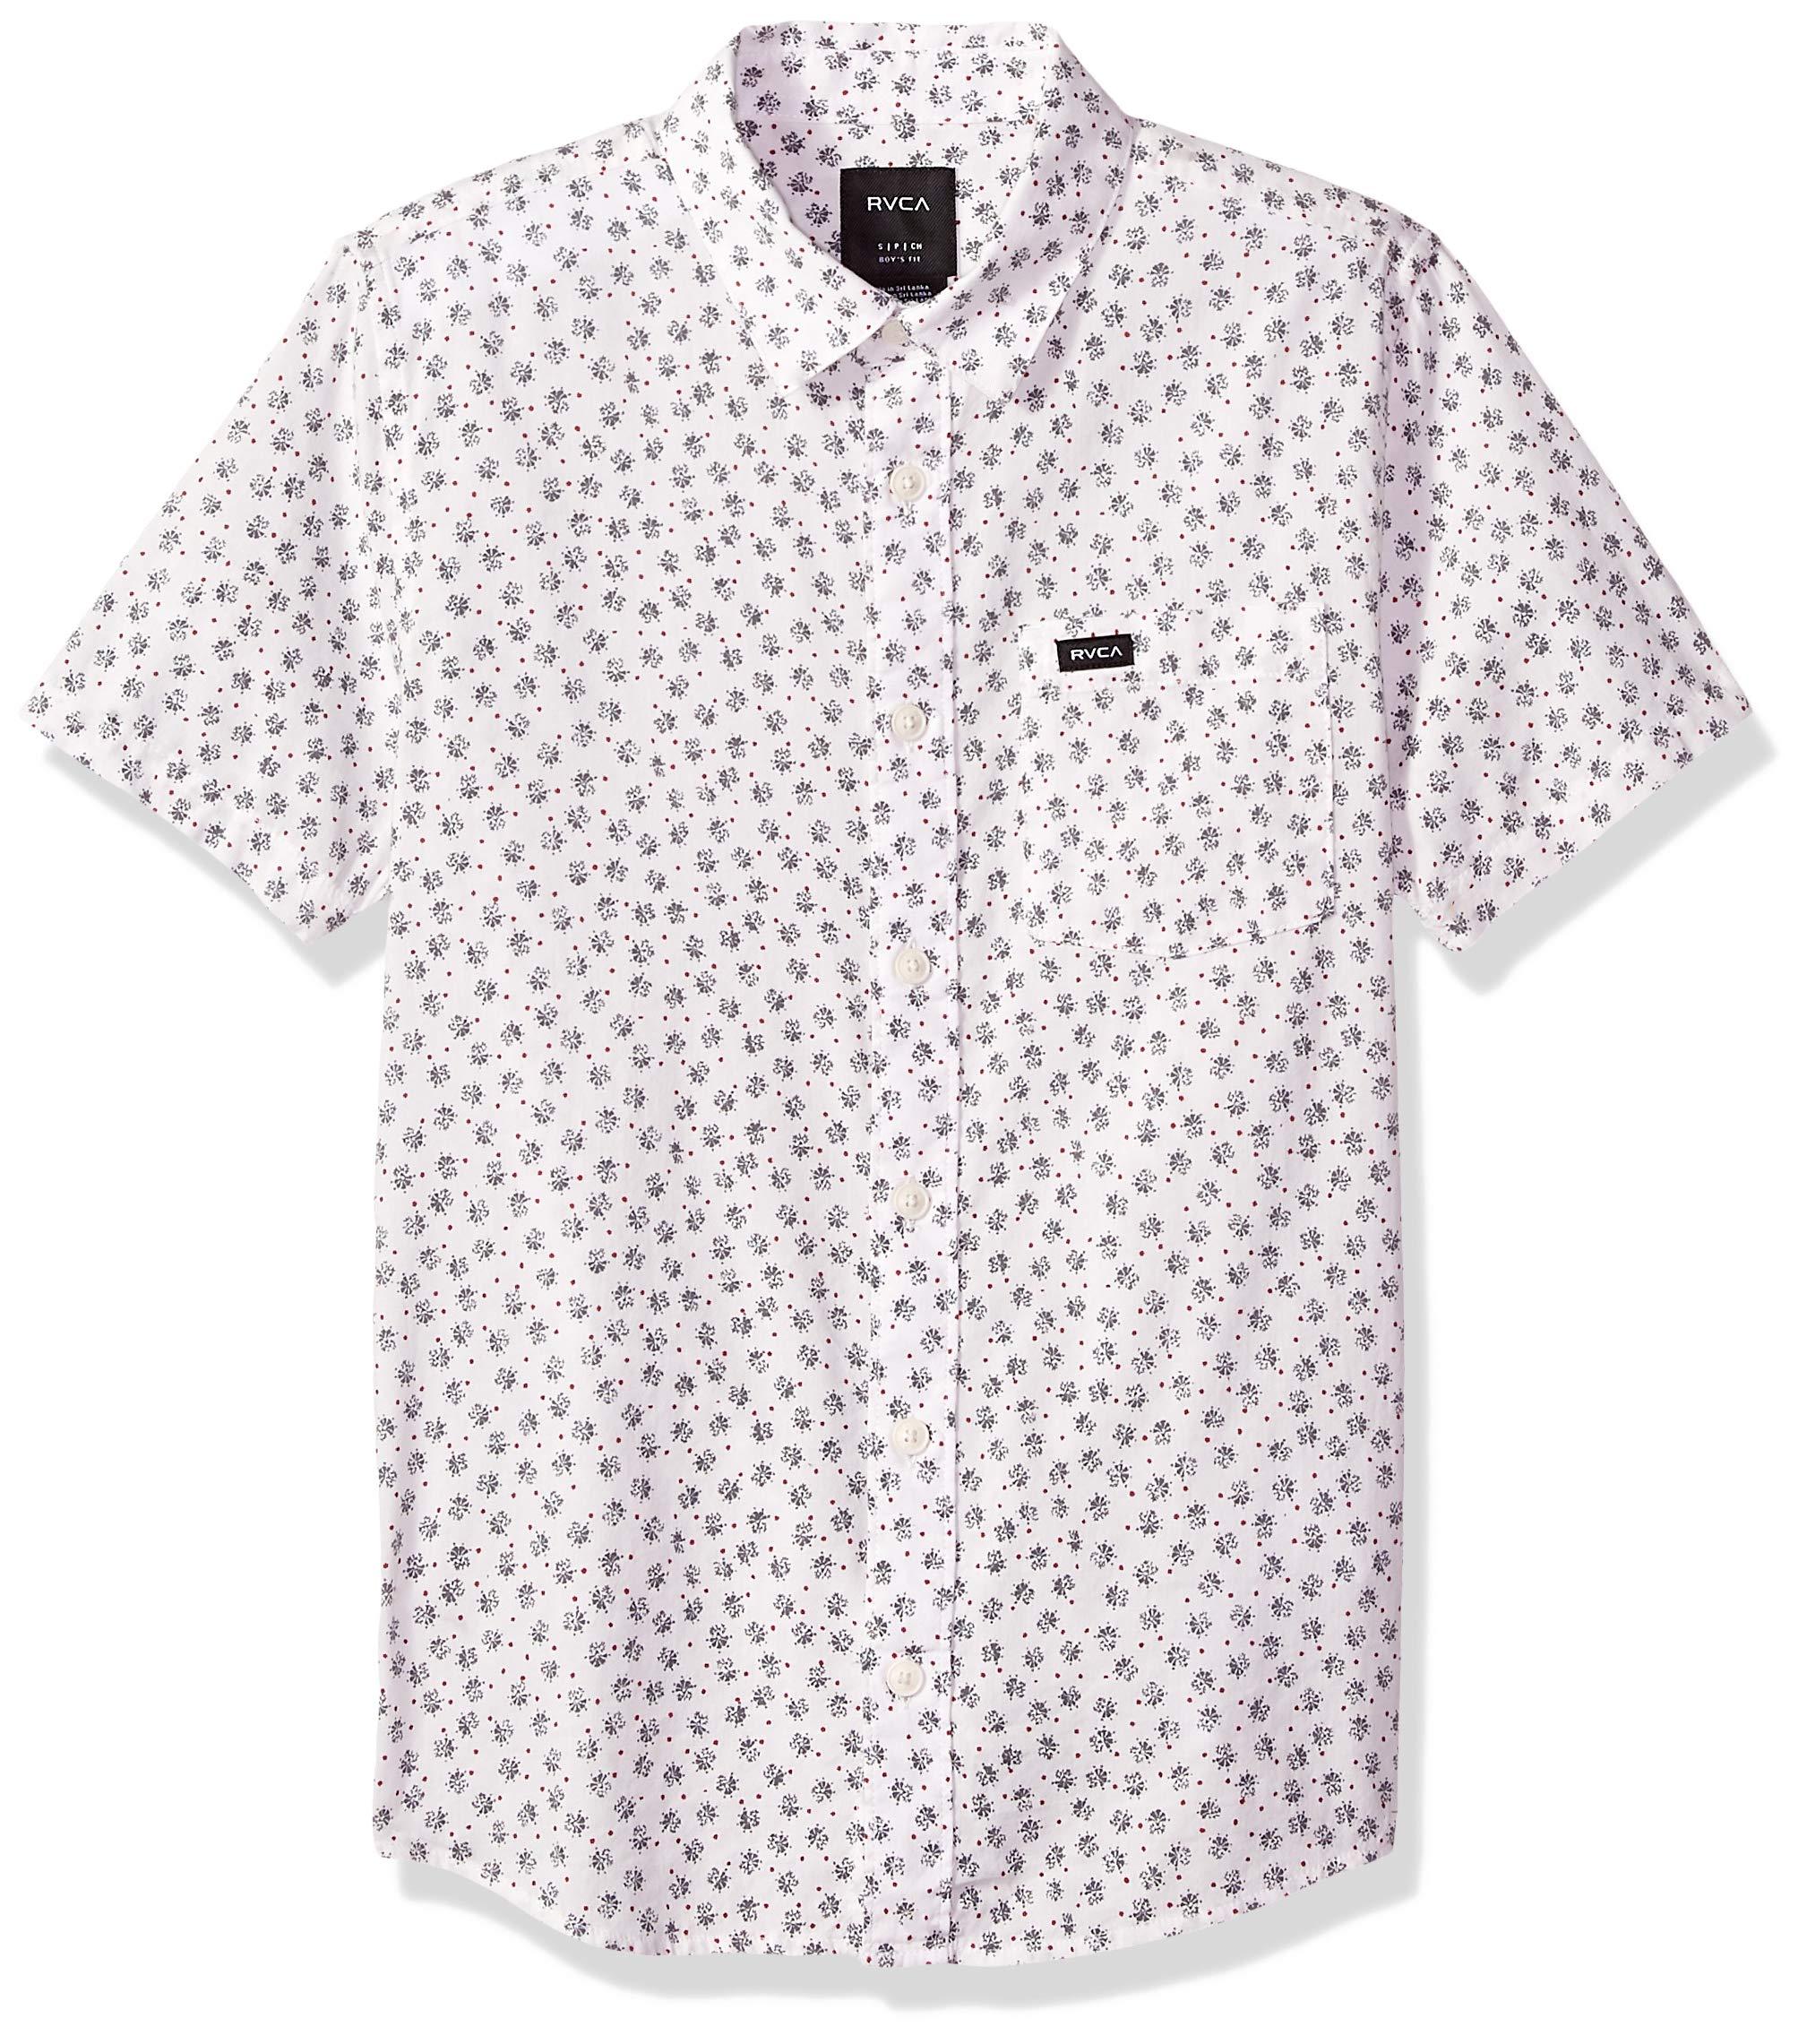 RVCA Boys' Big FICUS Floral Short Sleeve Woven Button UP Shirt, Antique/White, XL